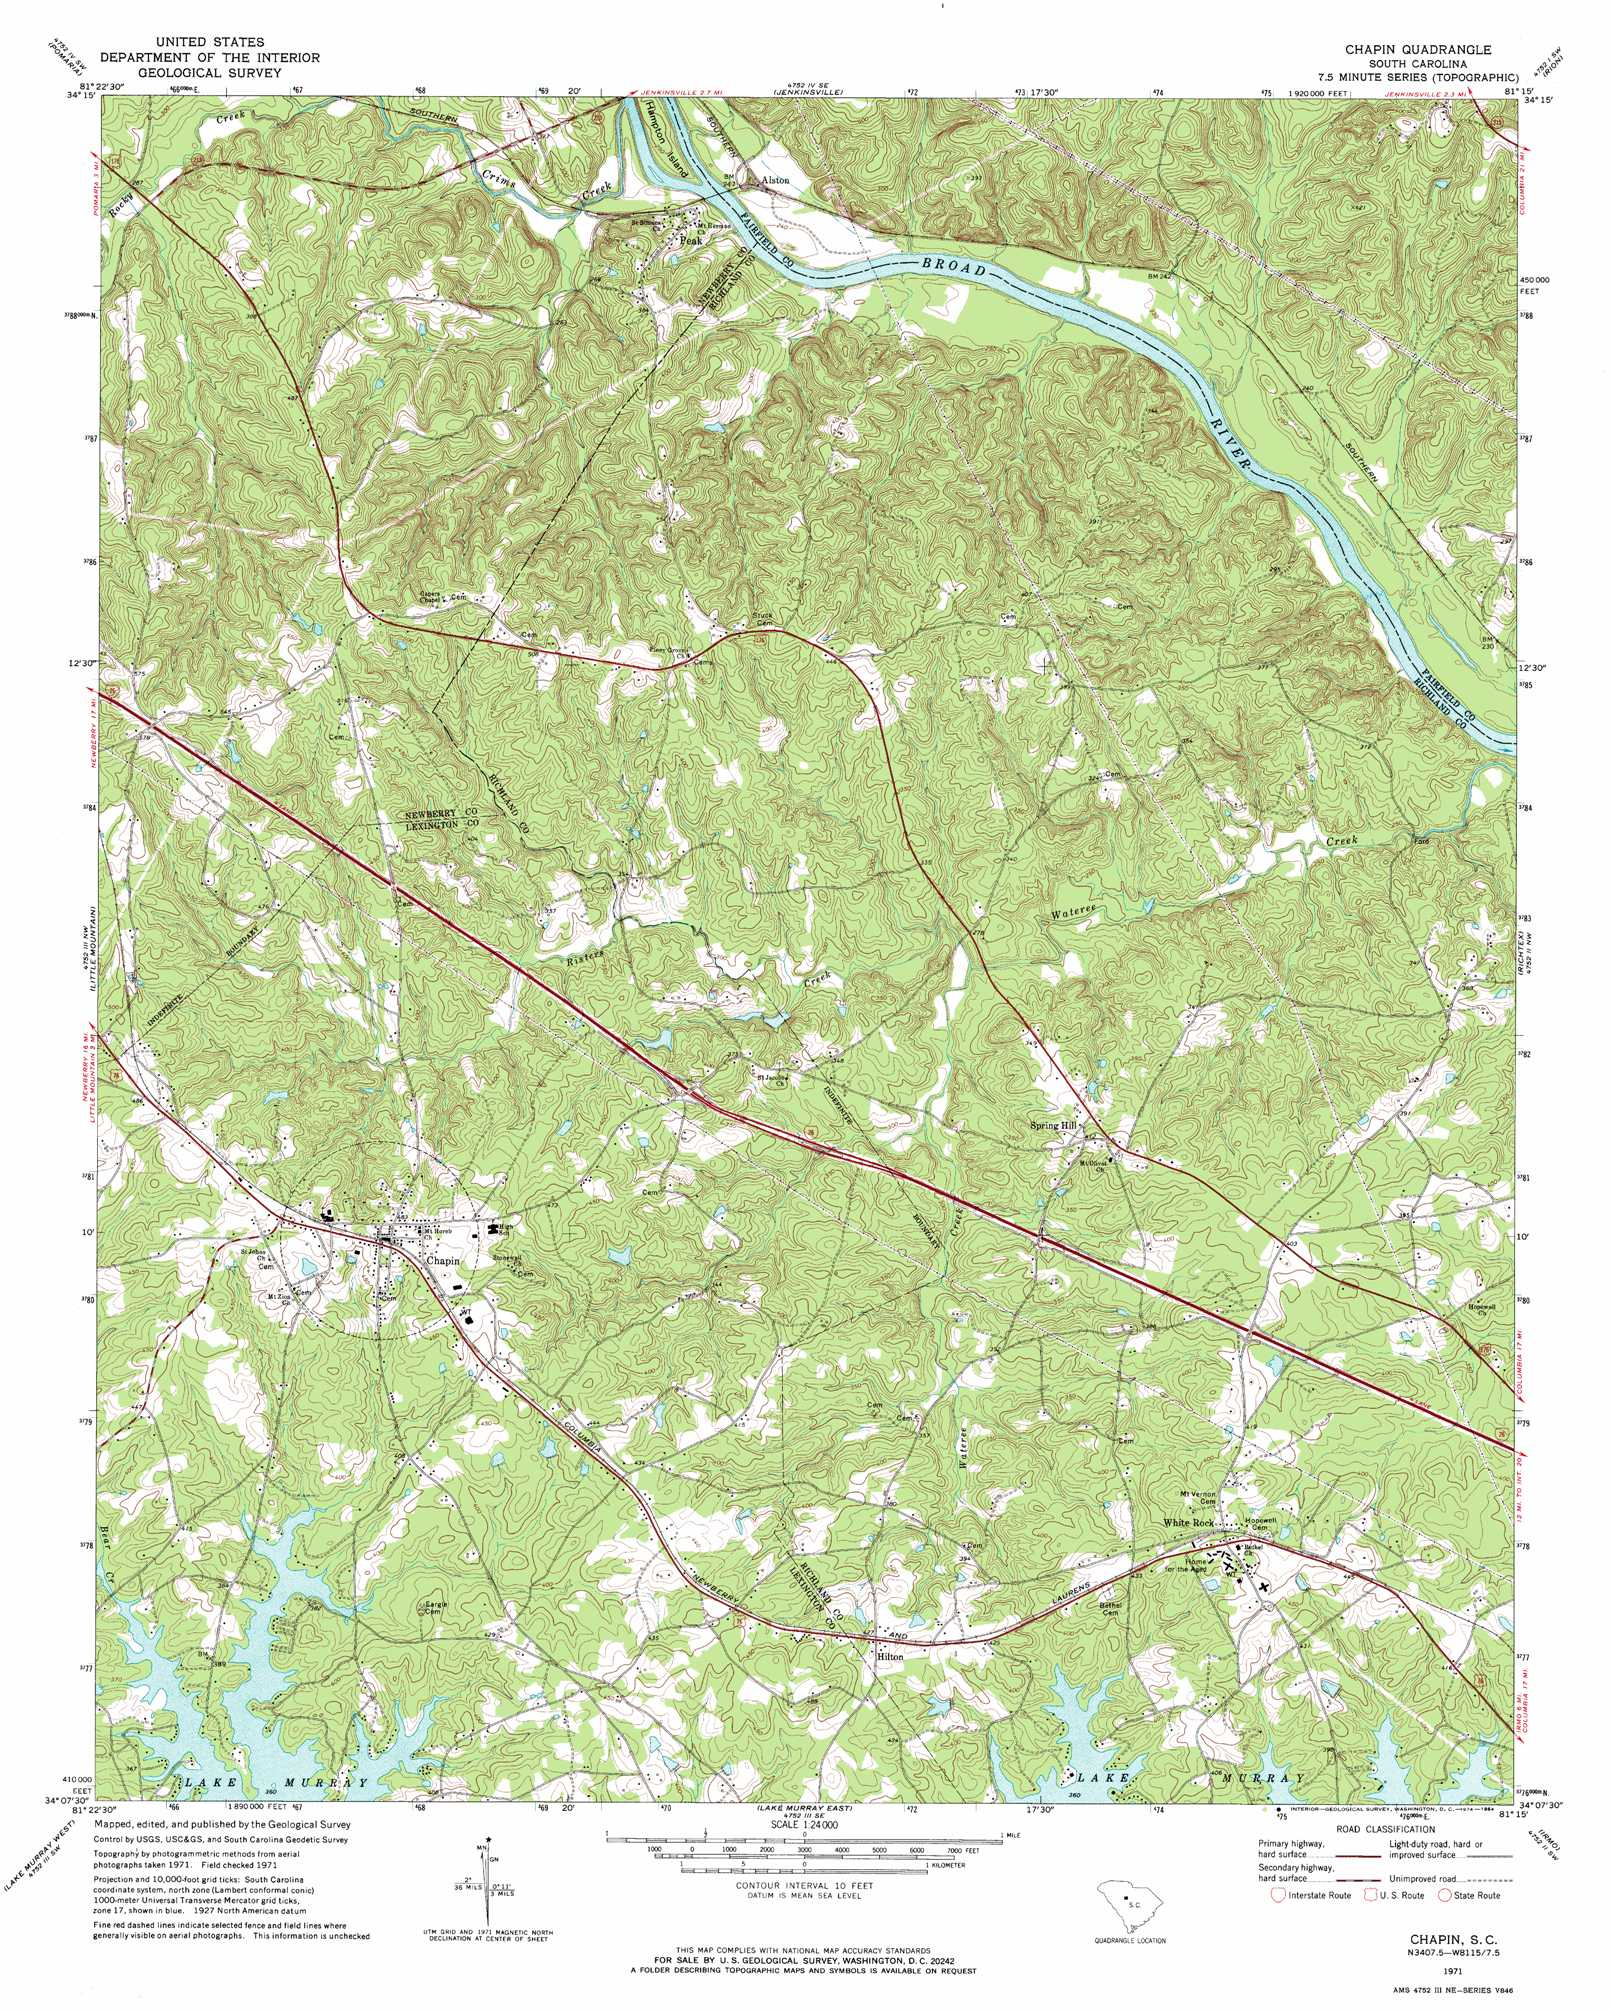 Chapin topographic map, SC - USGS Topo Quad 34081b3